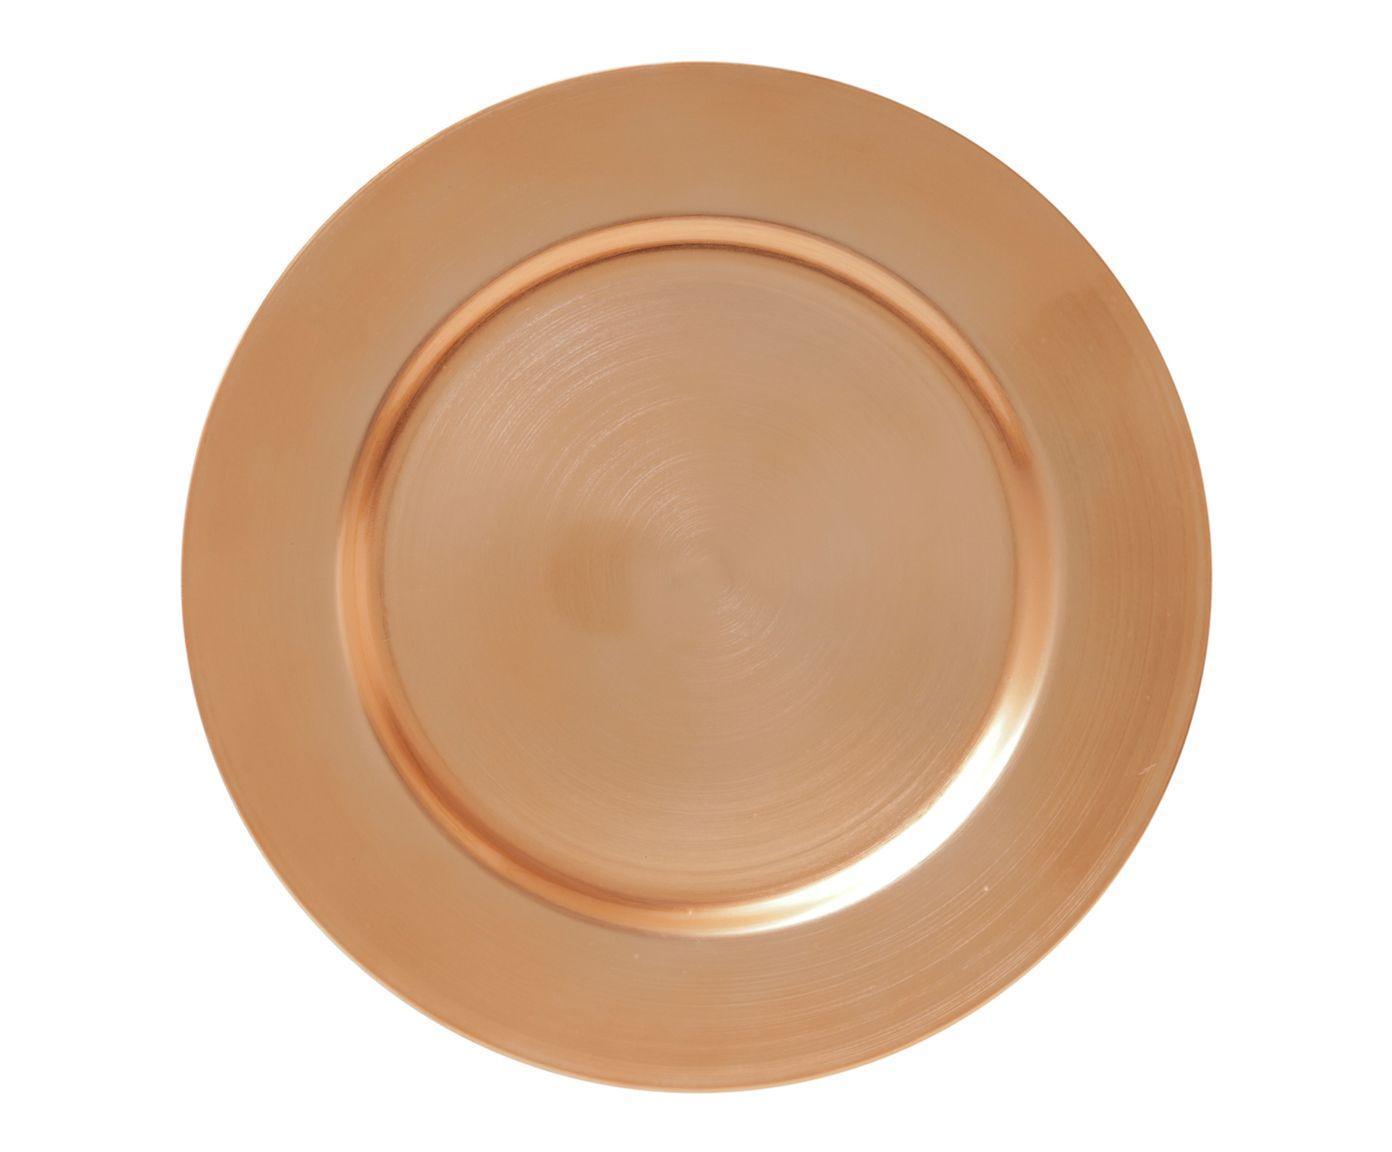 Sousplat Opala Dourado - 33cm | Westwing.com.br